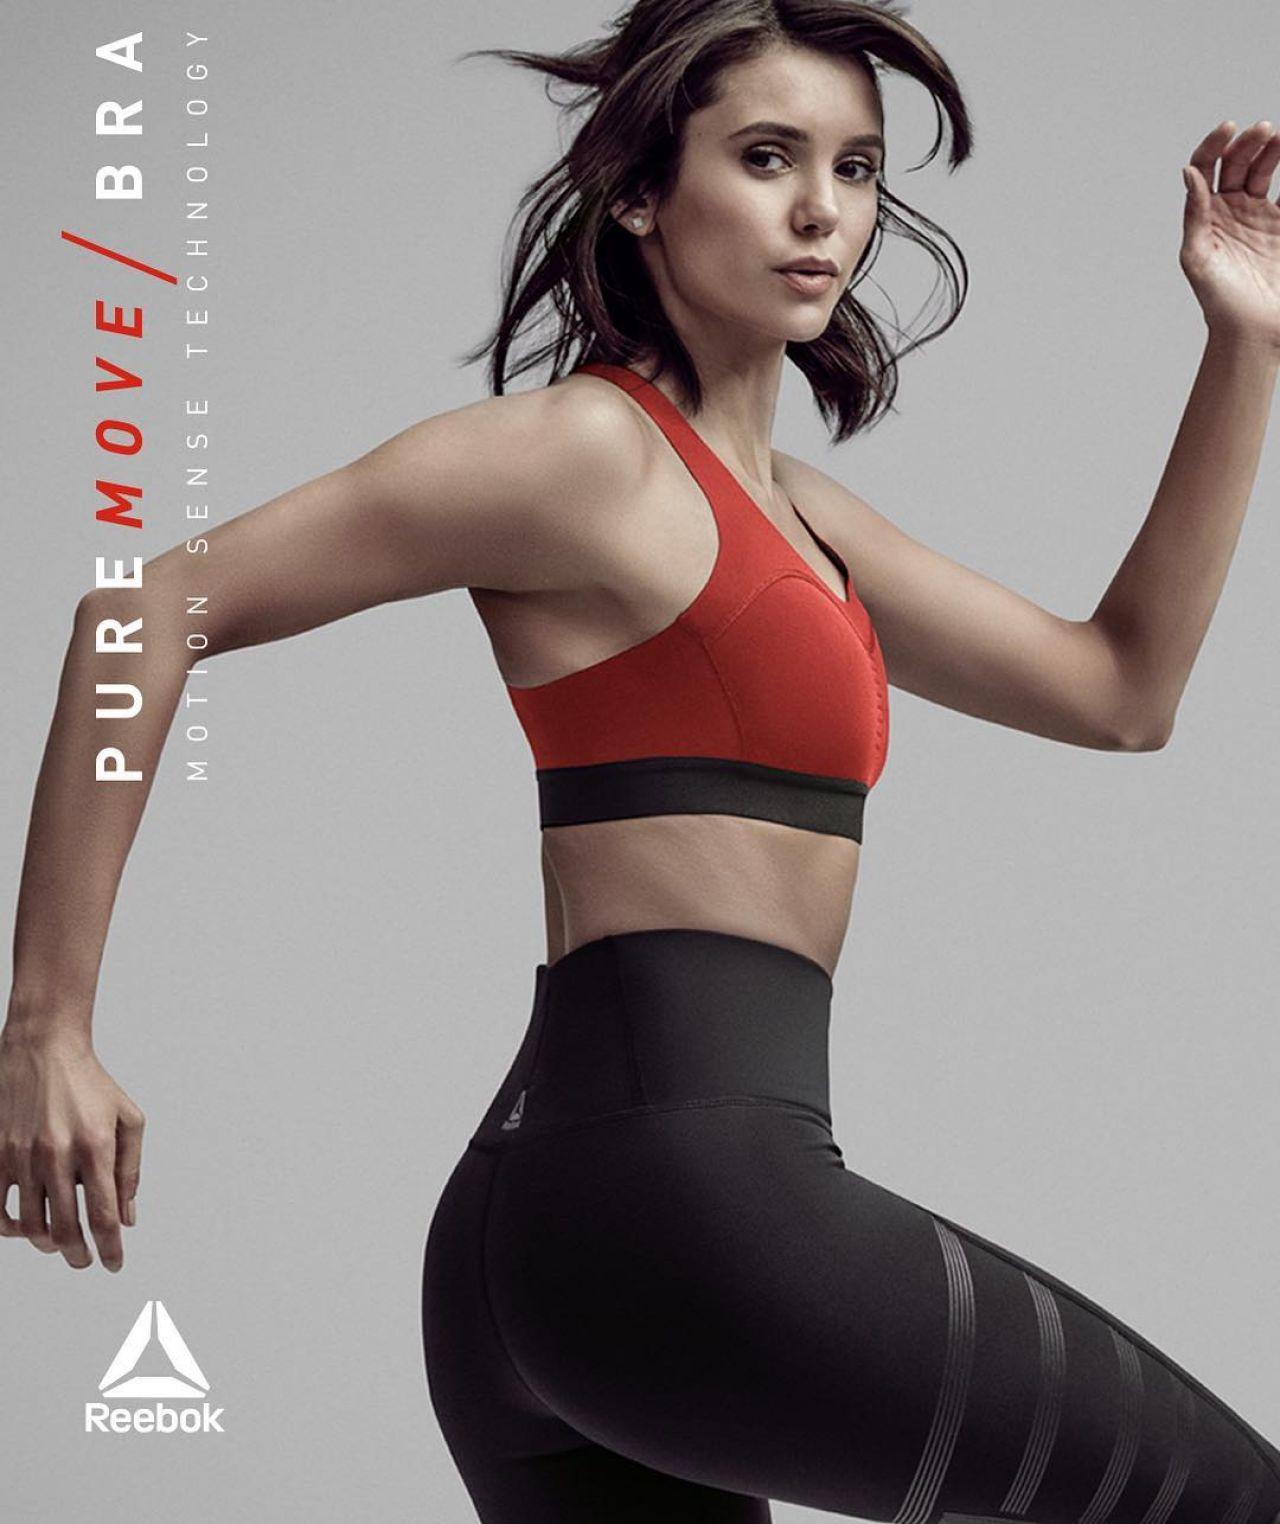 d74ce694cd18a0 Nina Dobrev is sexy in red Reebok sports bra